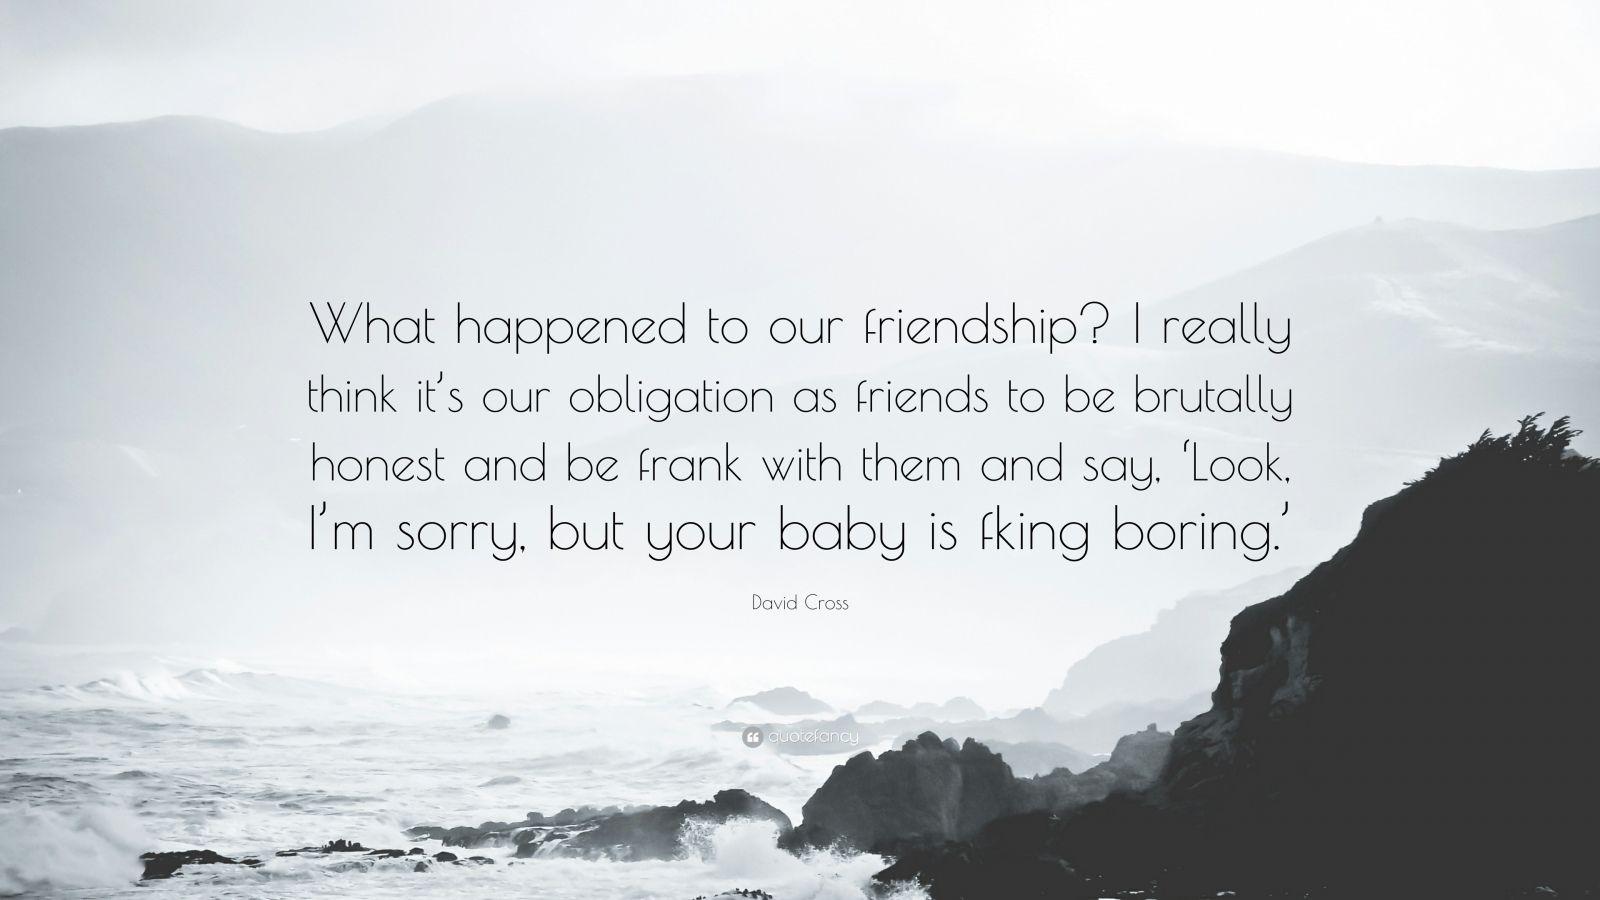 Brutally honest friends essay